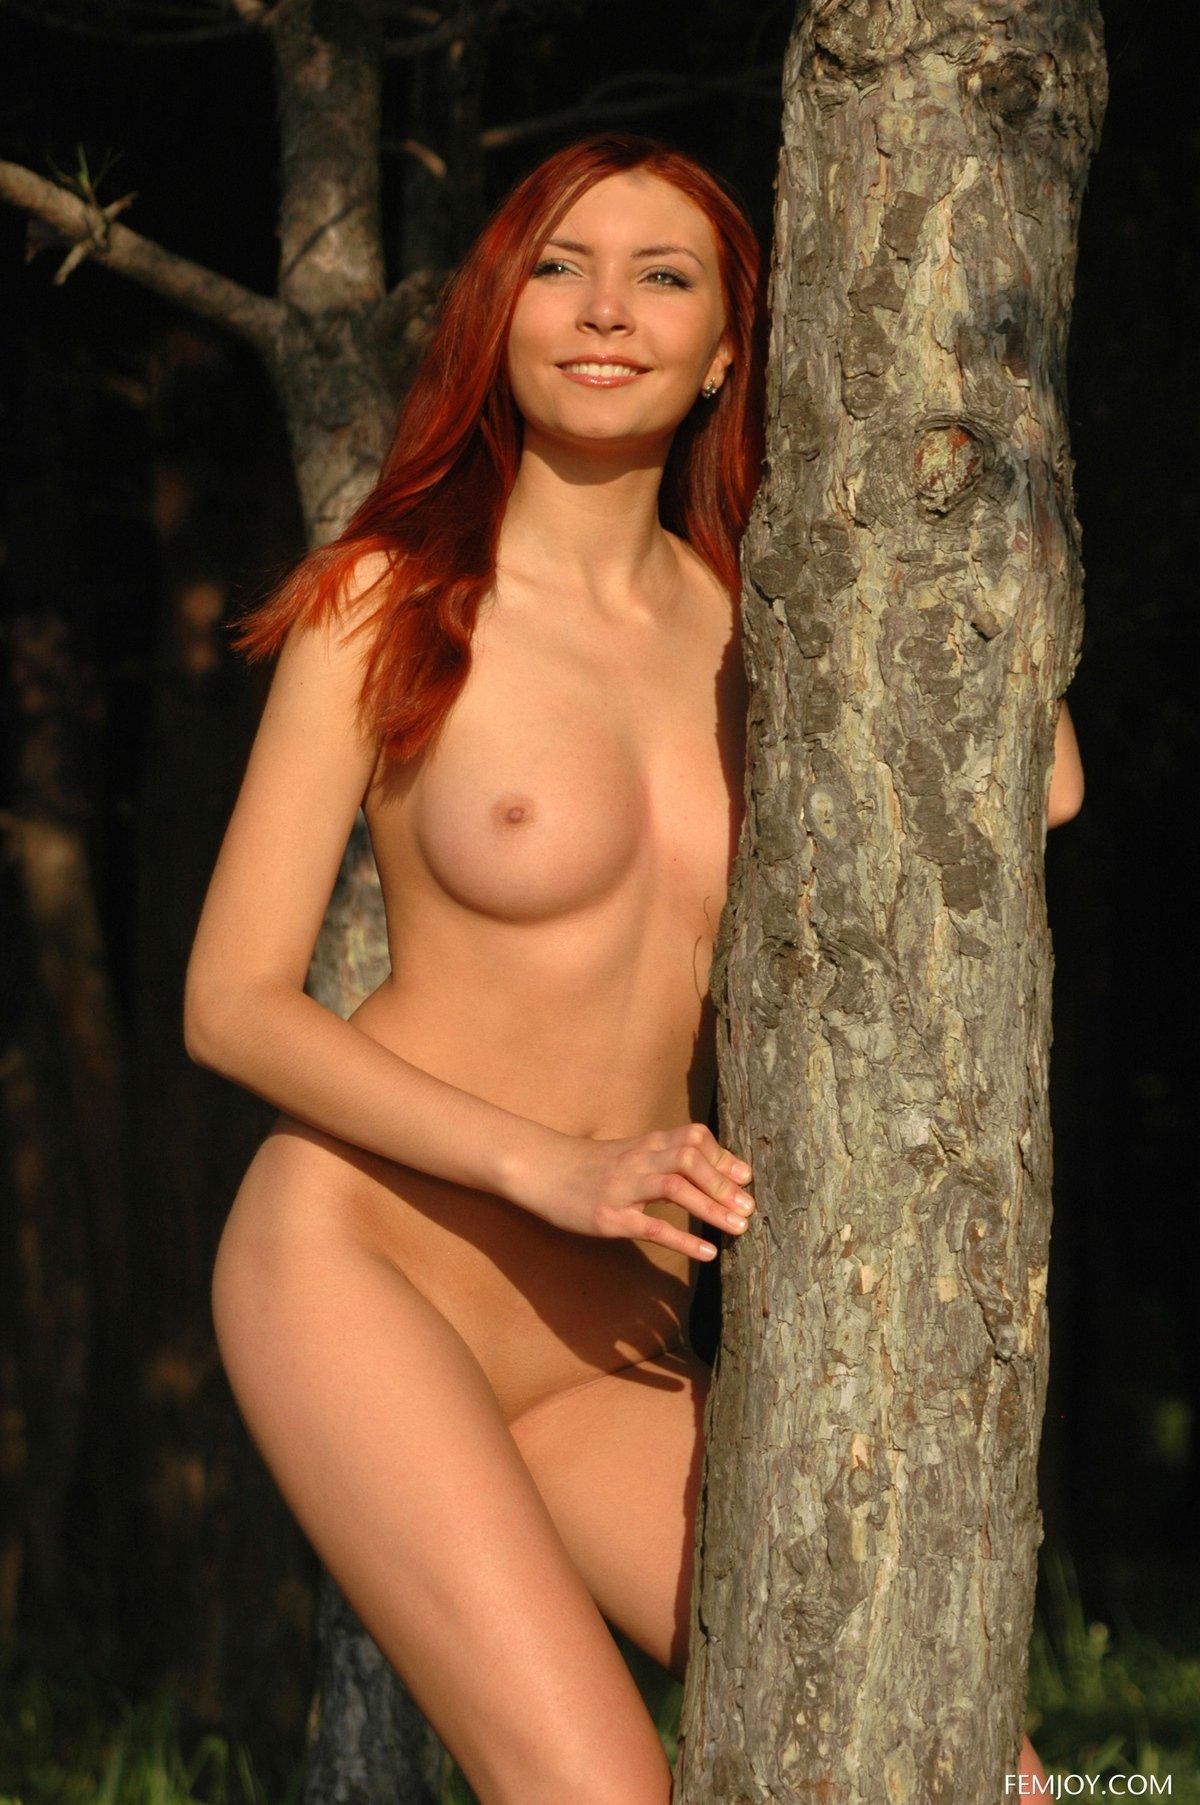 Милая рыжая сучка голая на природе